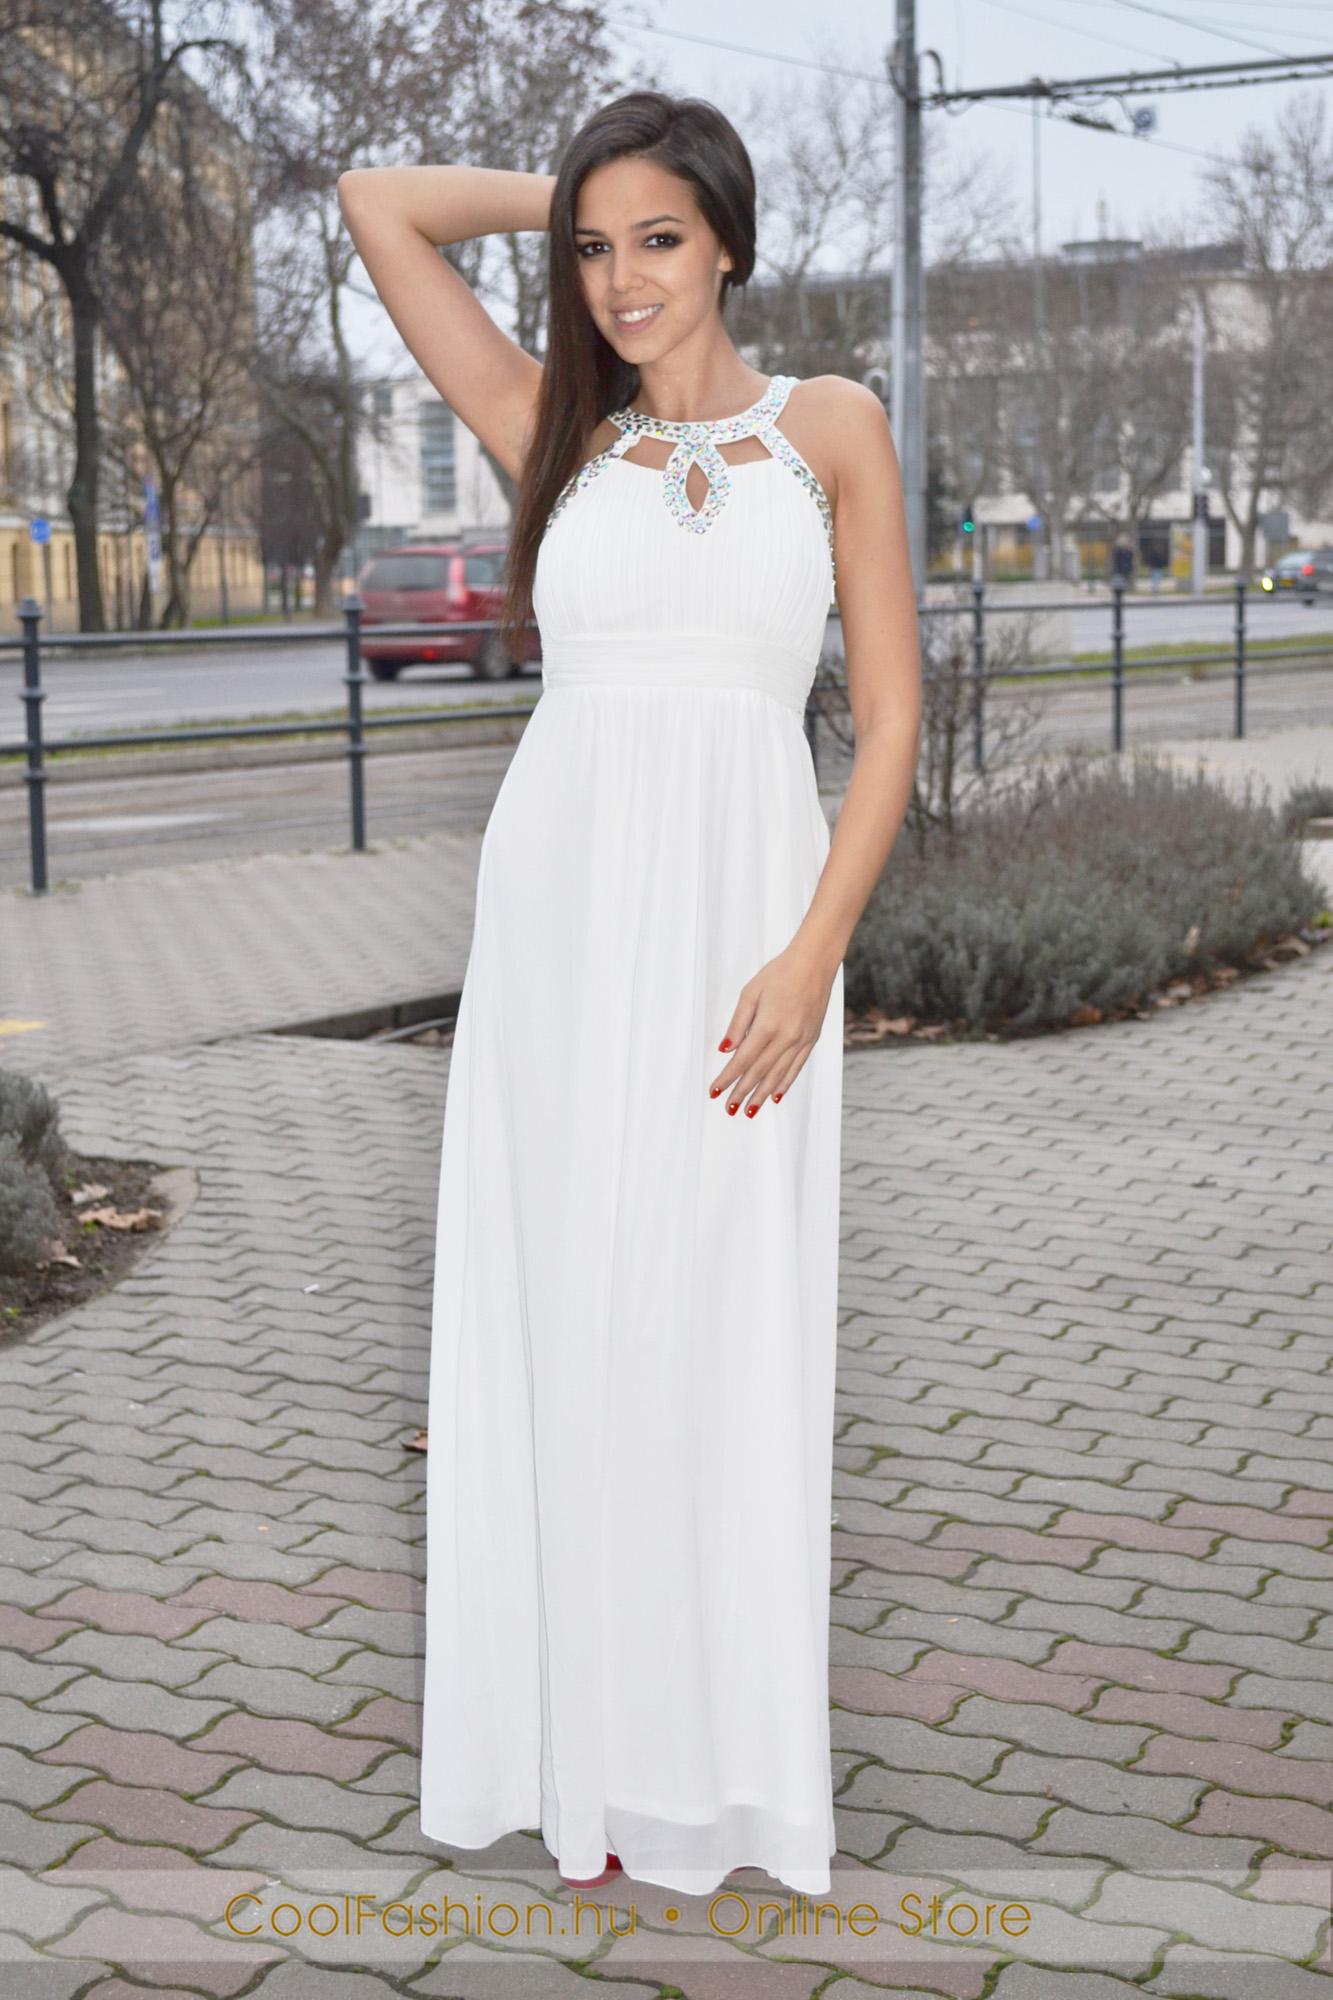 cb2c479d34 Fehér muszlin köves maxi ruha - Cool Fashion